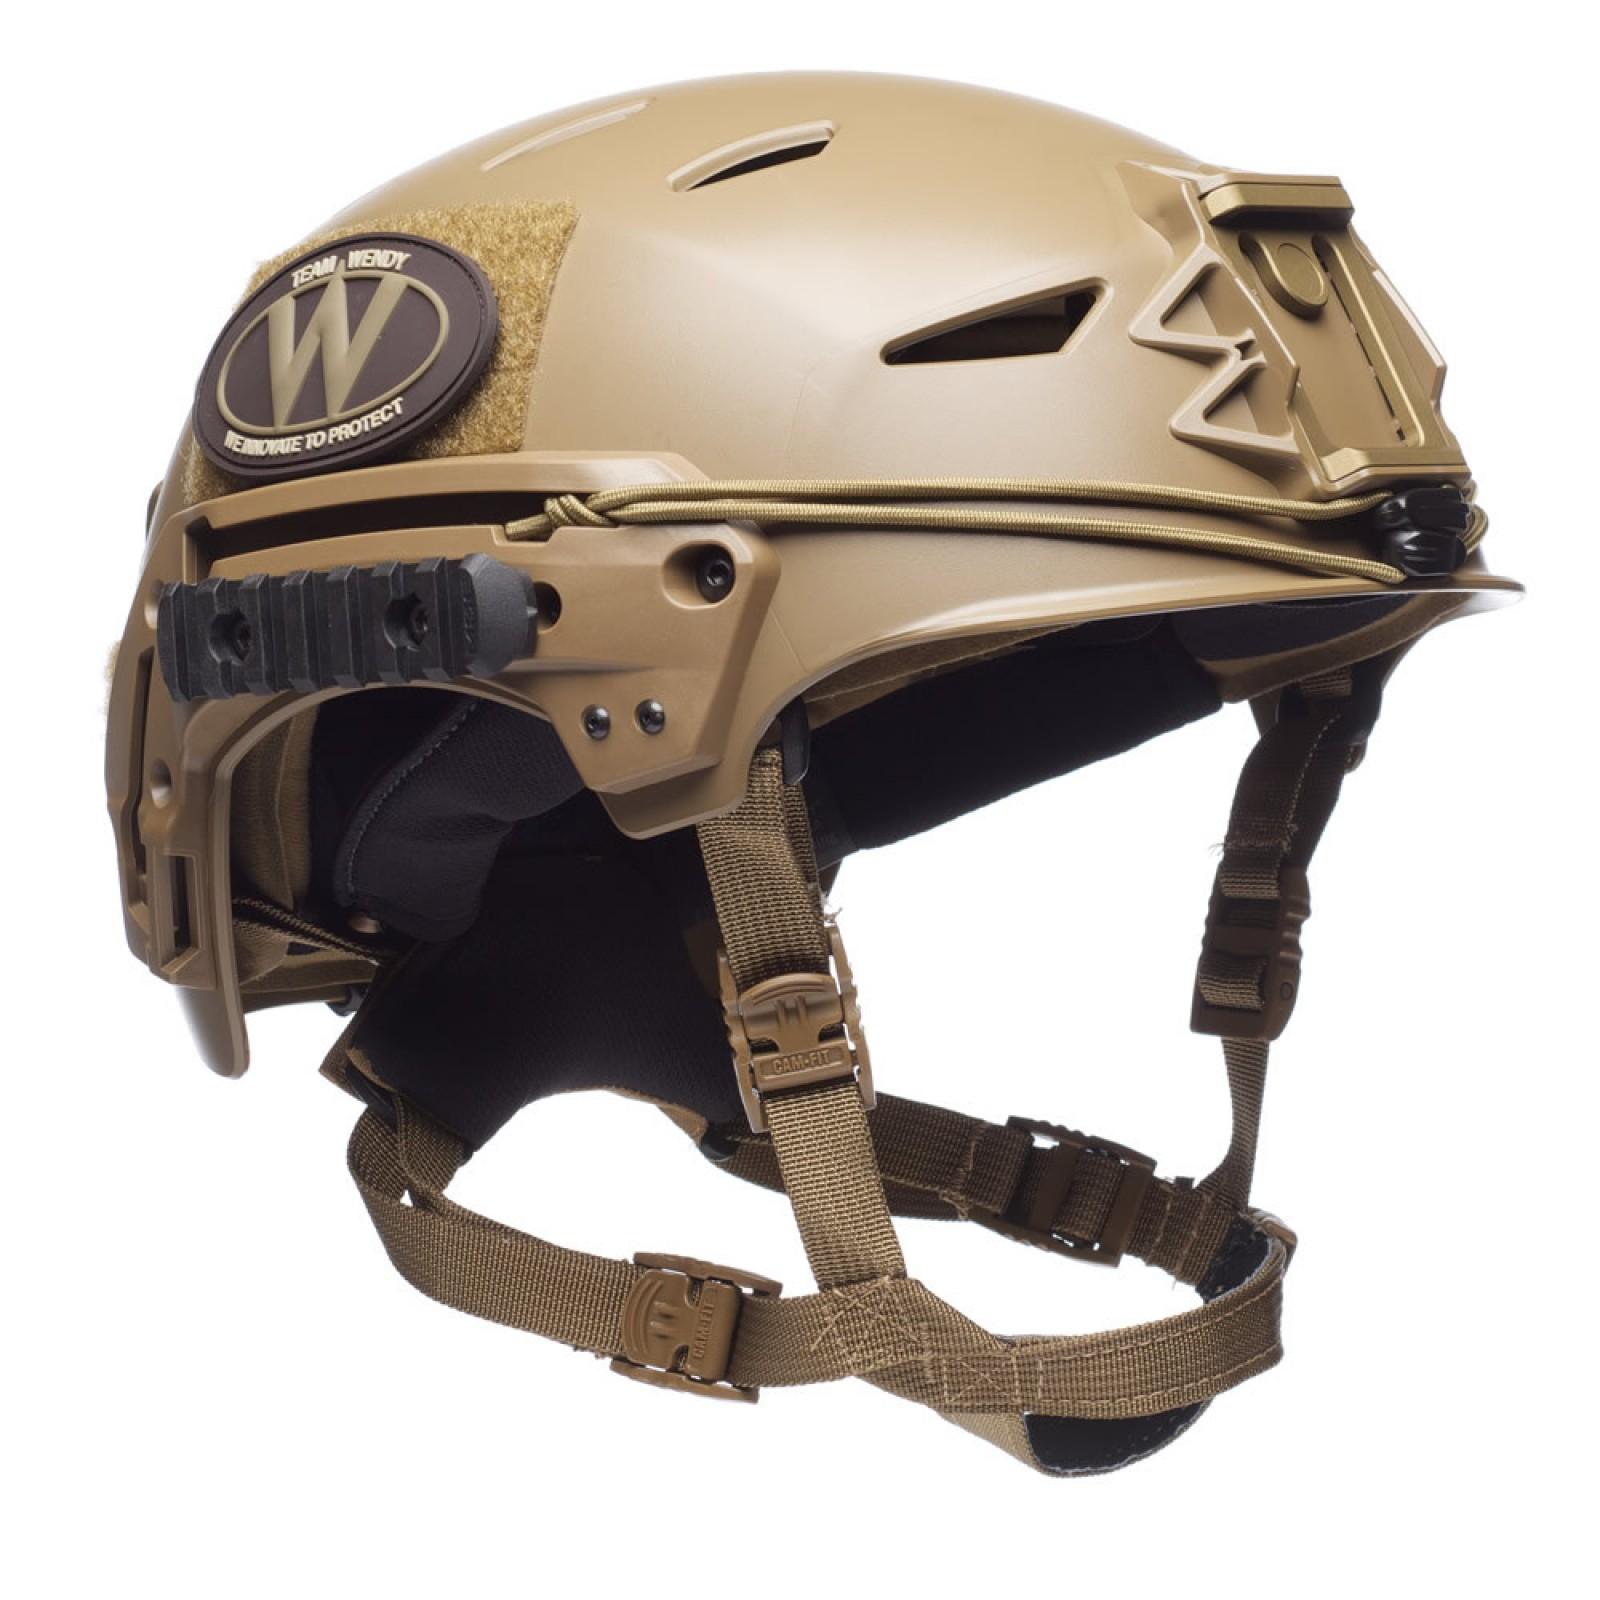 Helmet Bungee Cargo System for Tactical Bump Helmet Team Wendy EXFIL, etc.